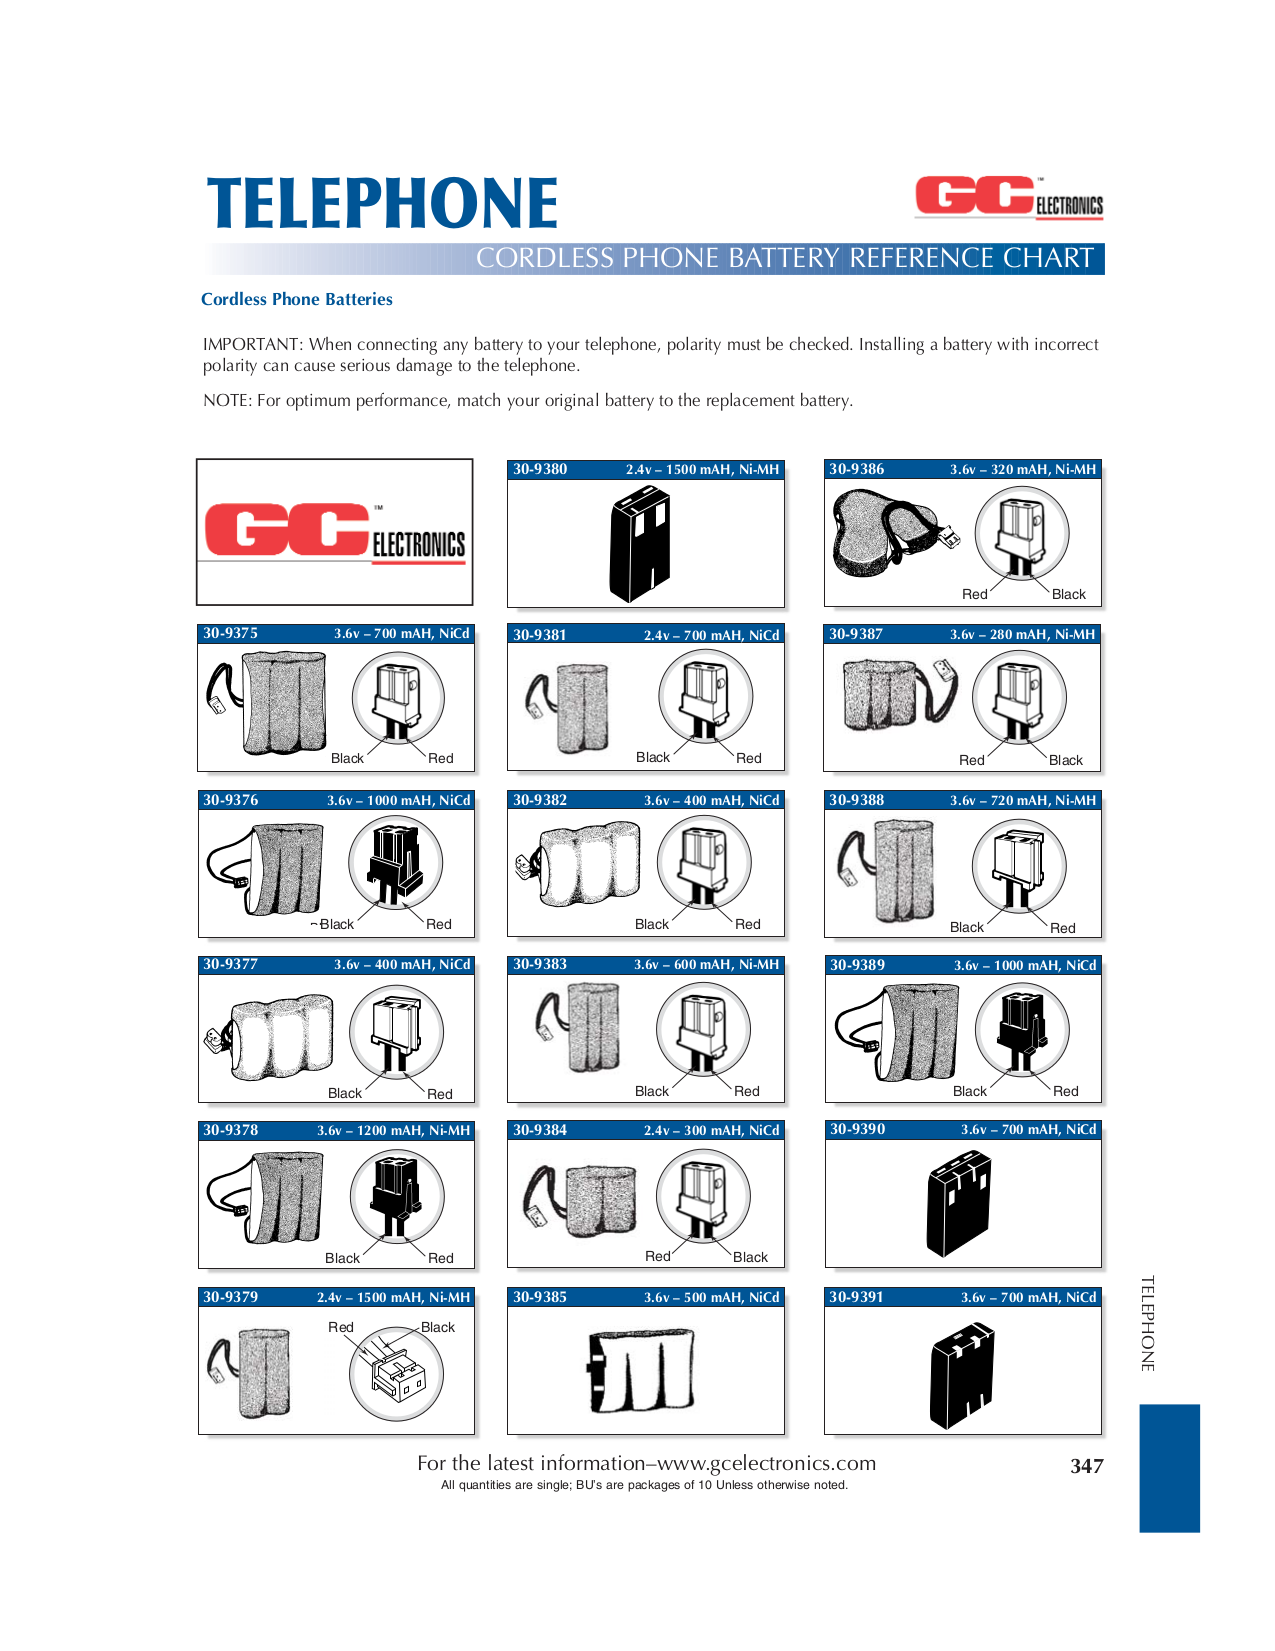 pdf for Vtech Telephone vt2468 manual